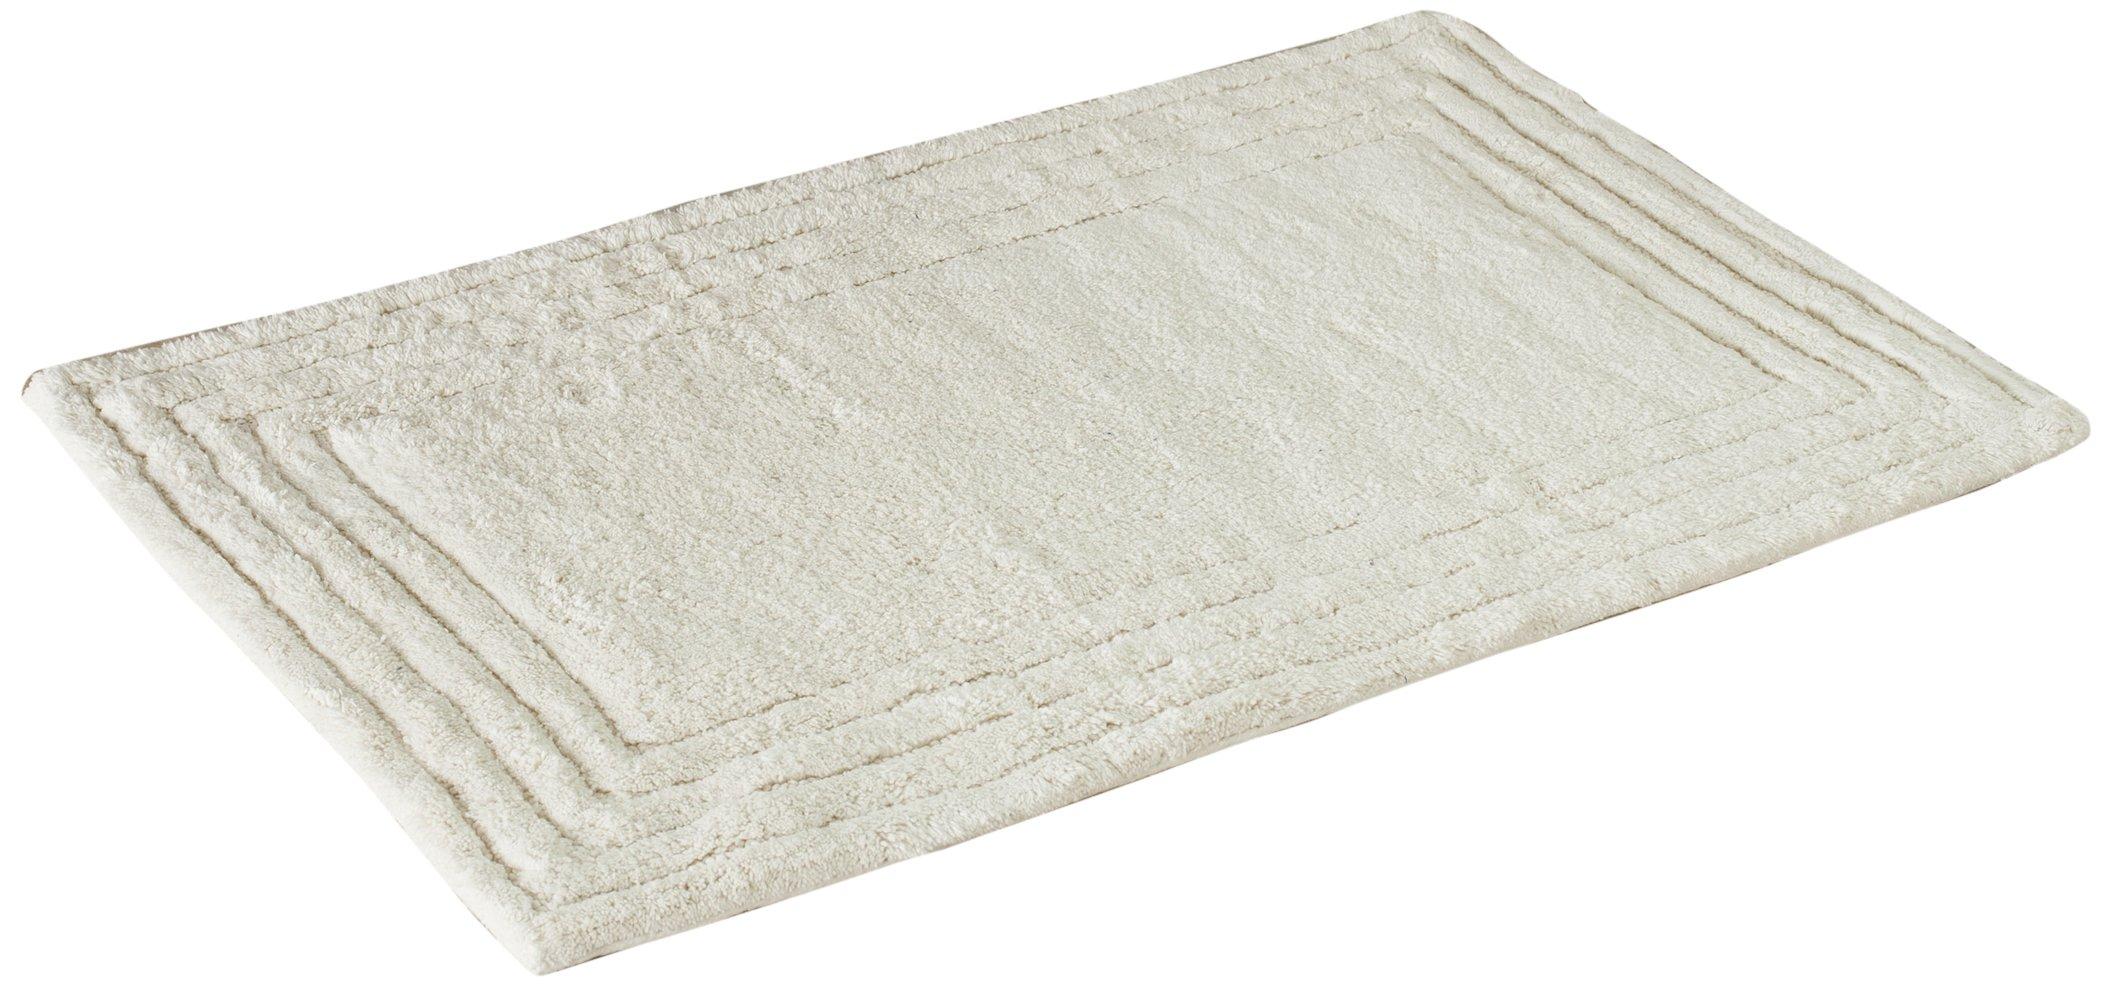 Safavieh Plush Master Bath Collection PMB631N Handmade Natural Cotton Bath Mat, 2 feet 3 inches by 3 feet 9 inches (2'3'' x 3'9'') (Set of 2)